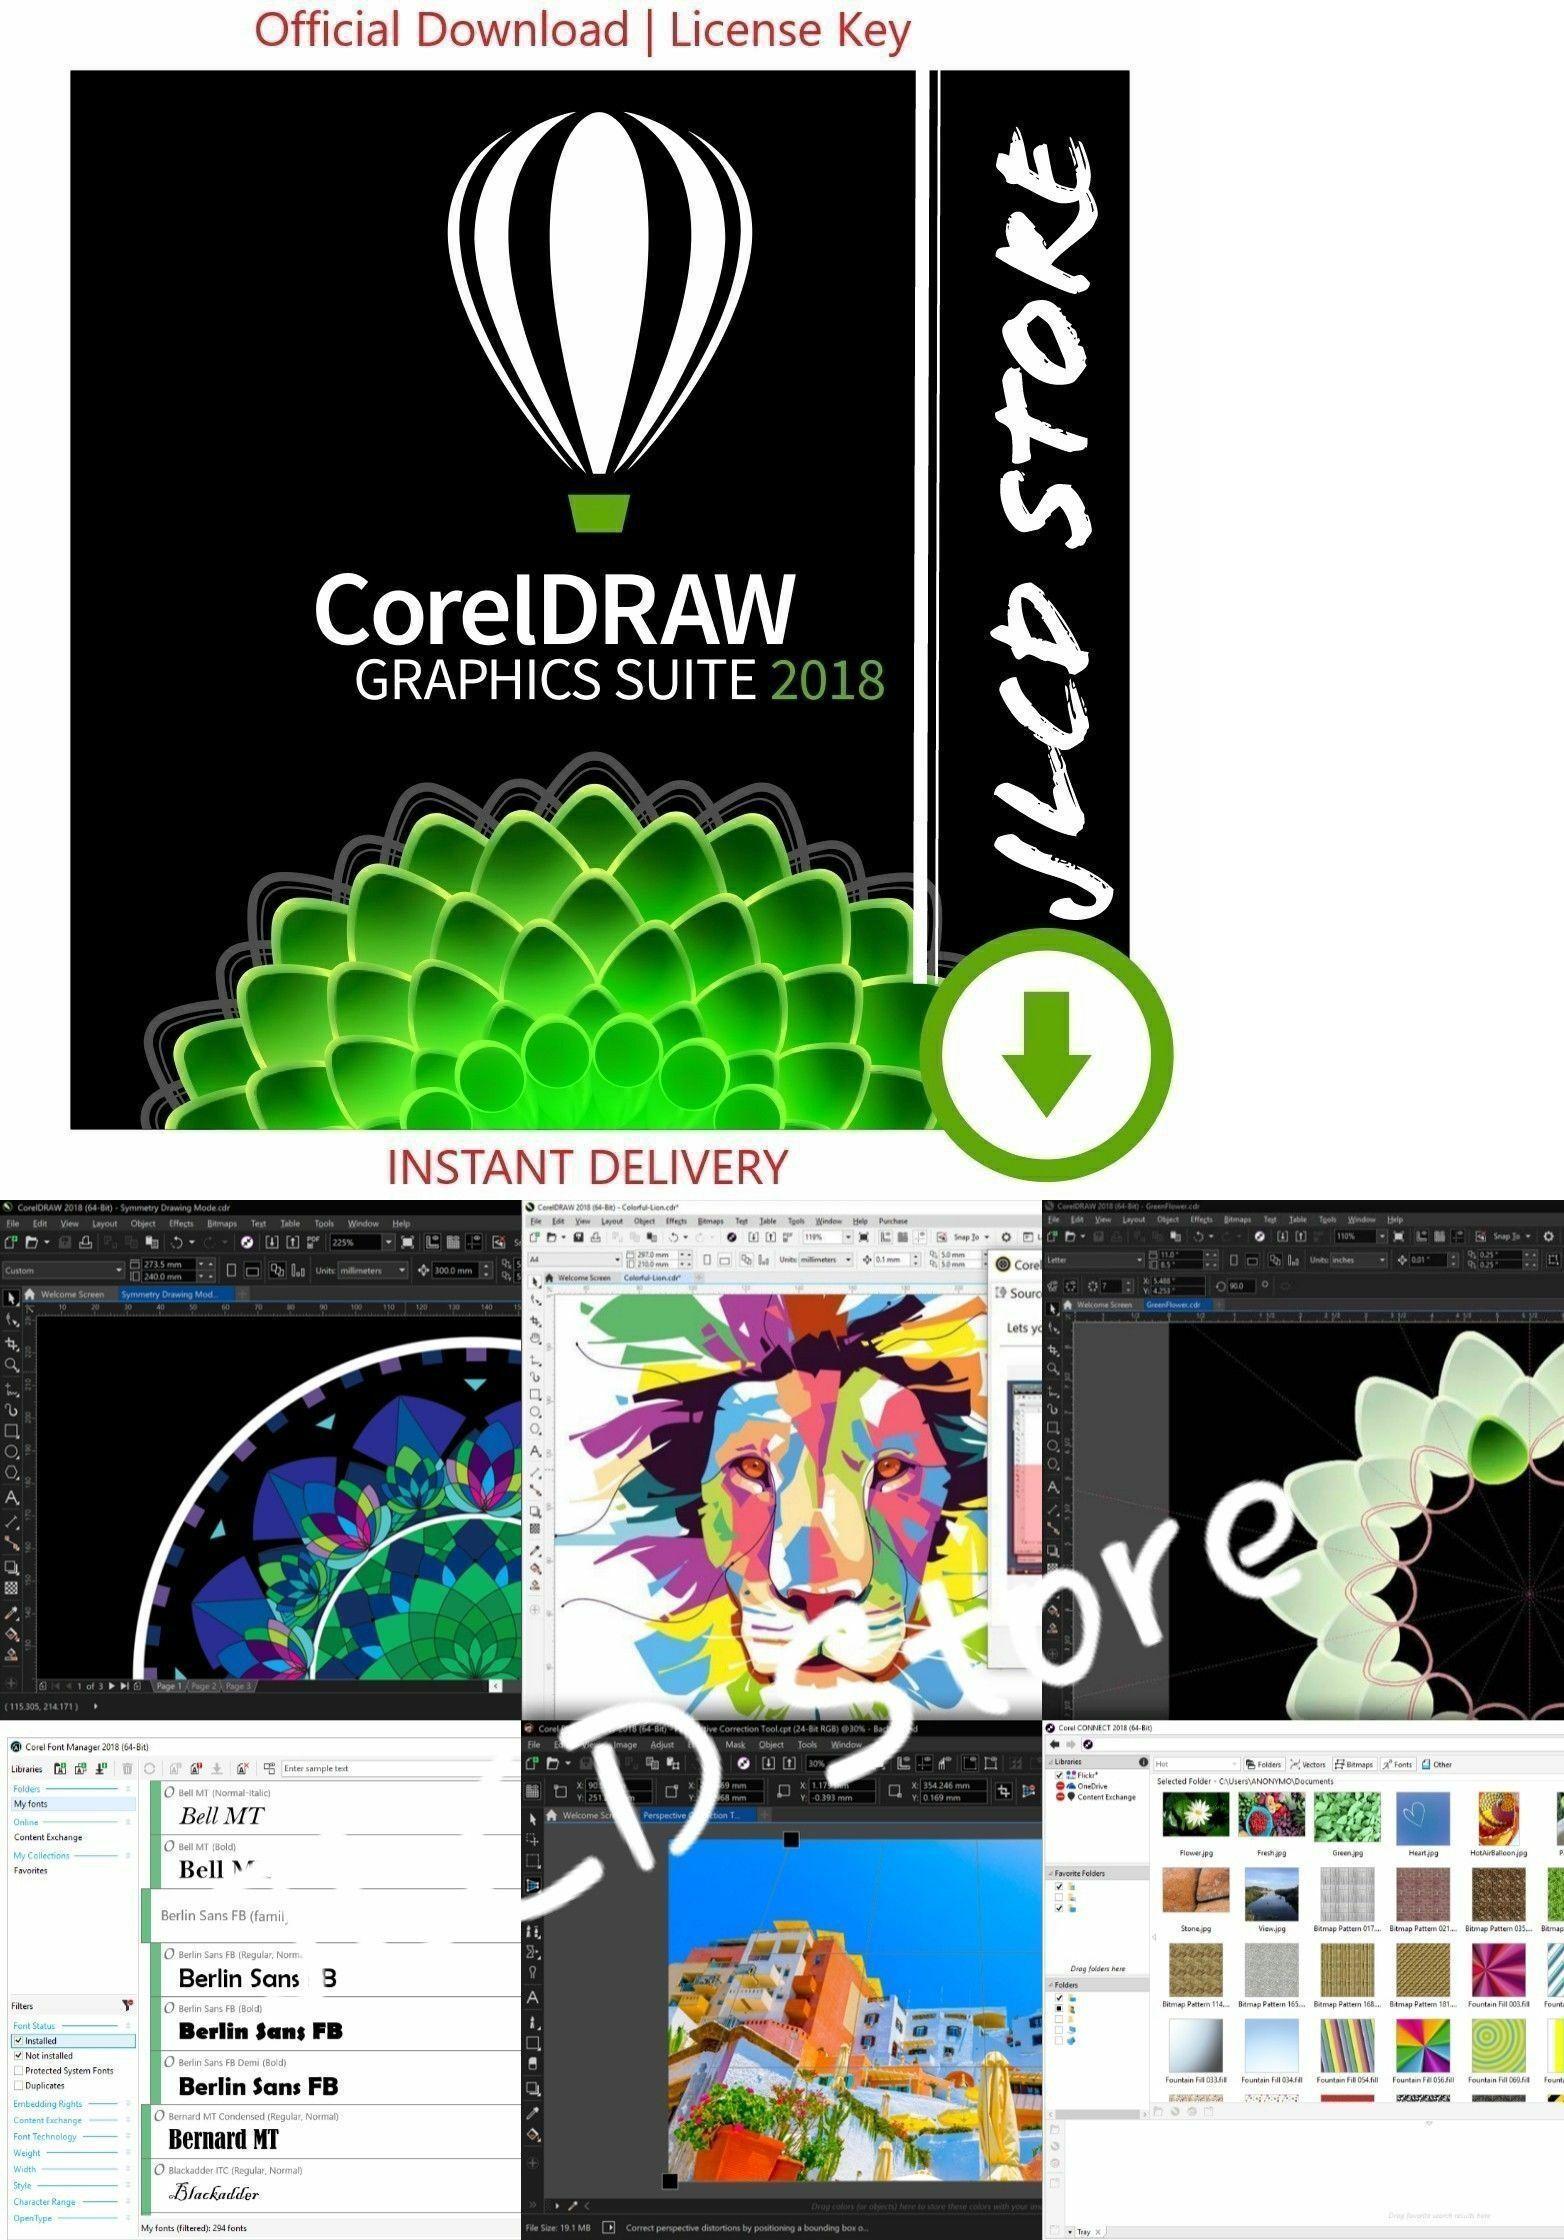 Image Video and Audio 41859: Coreldraw Graphics Suite 2018